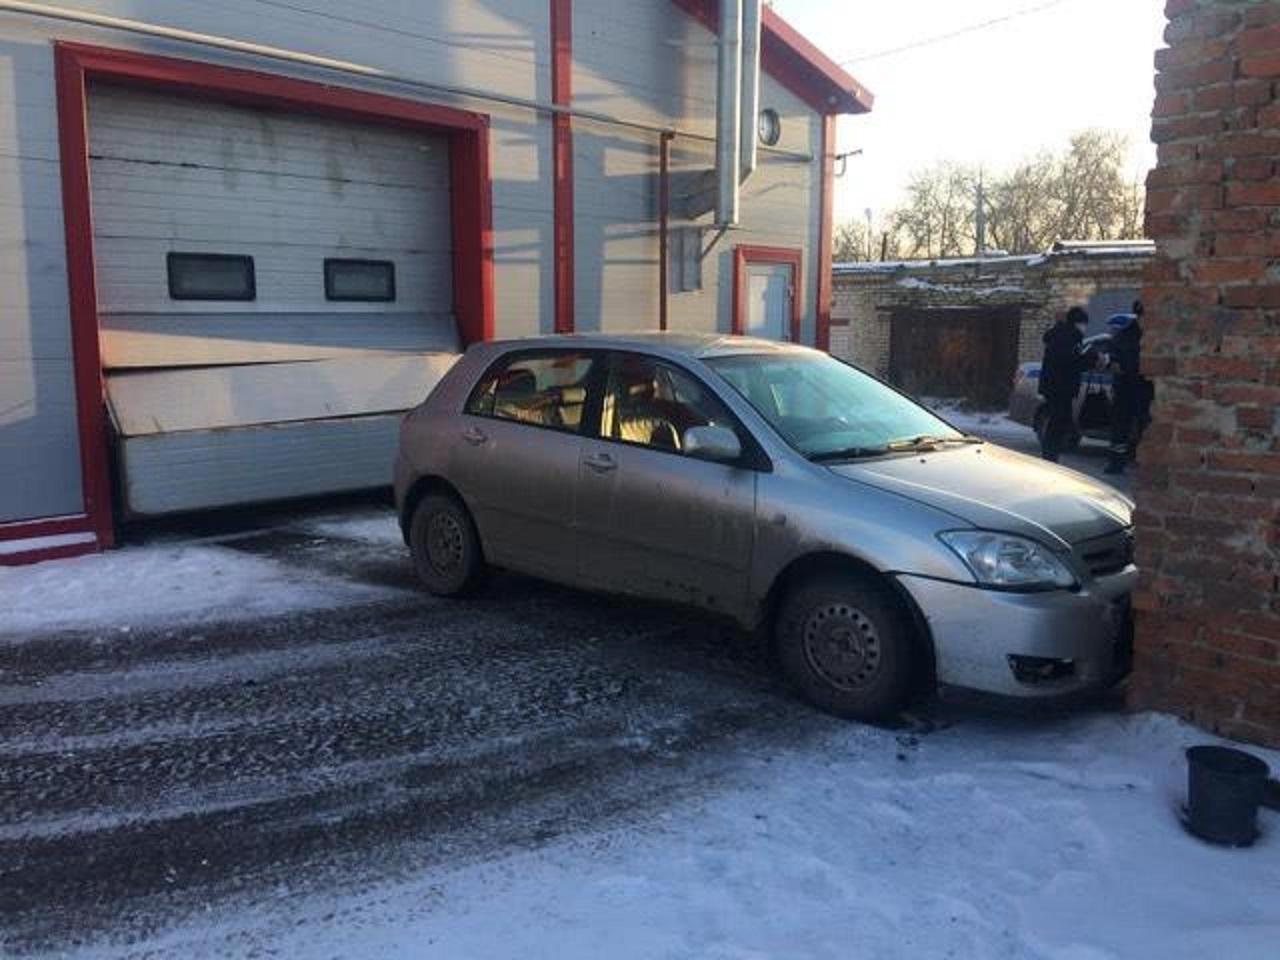 Автоледи перепутала педали: пострадала сотрудница автомойки